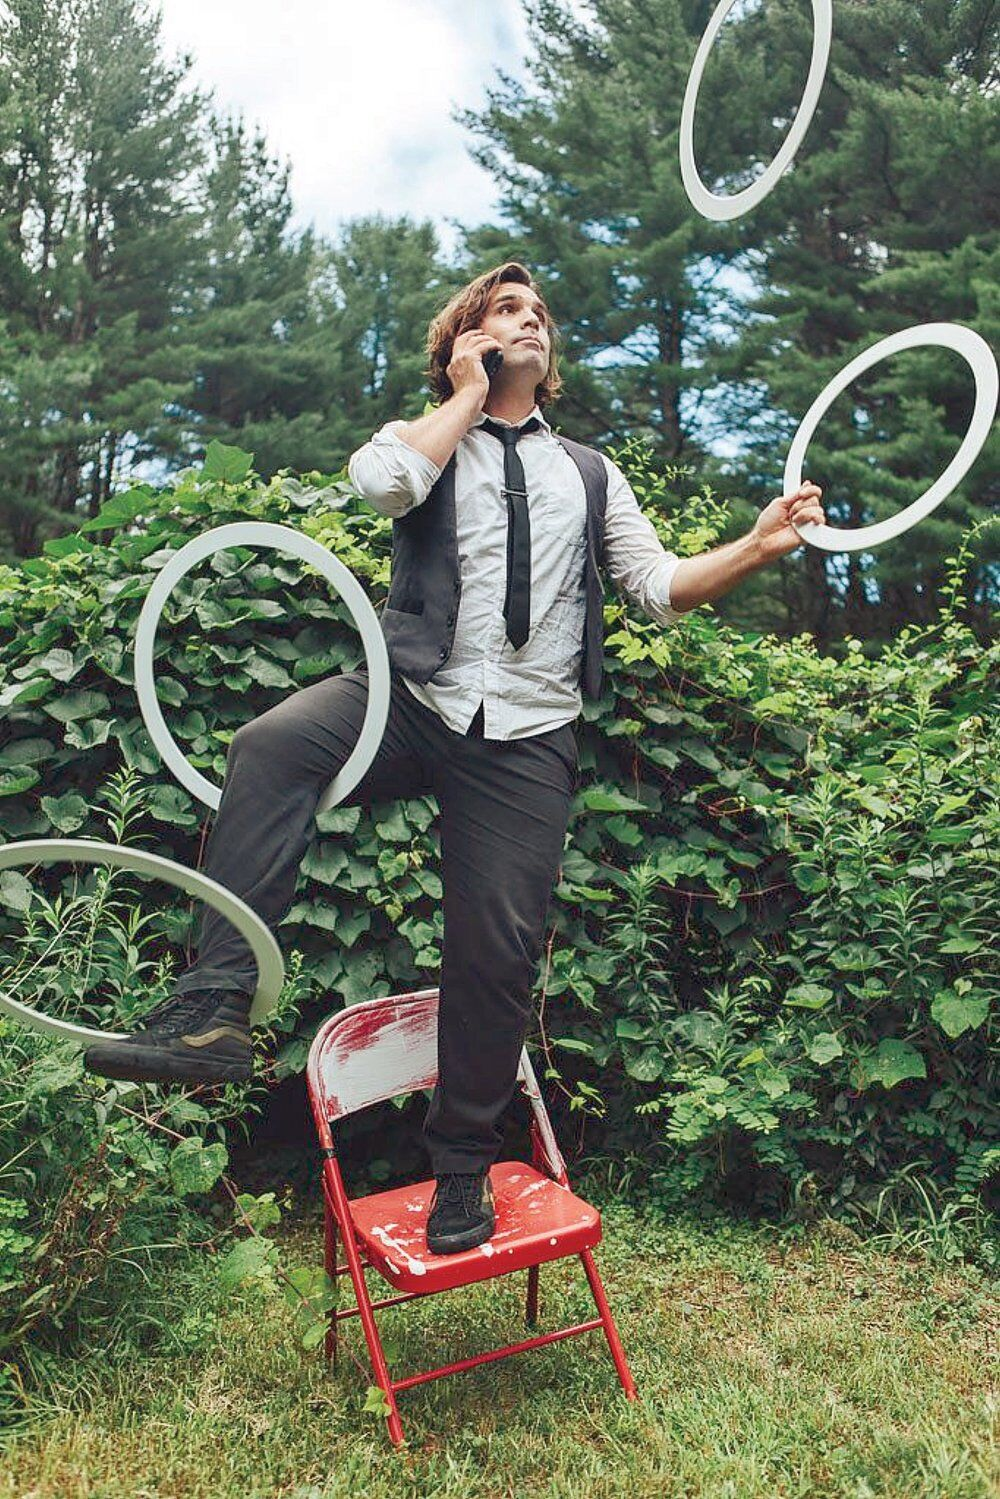 Juggler reaches for pen in pandemic